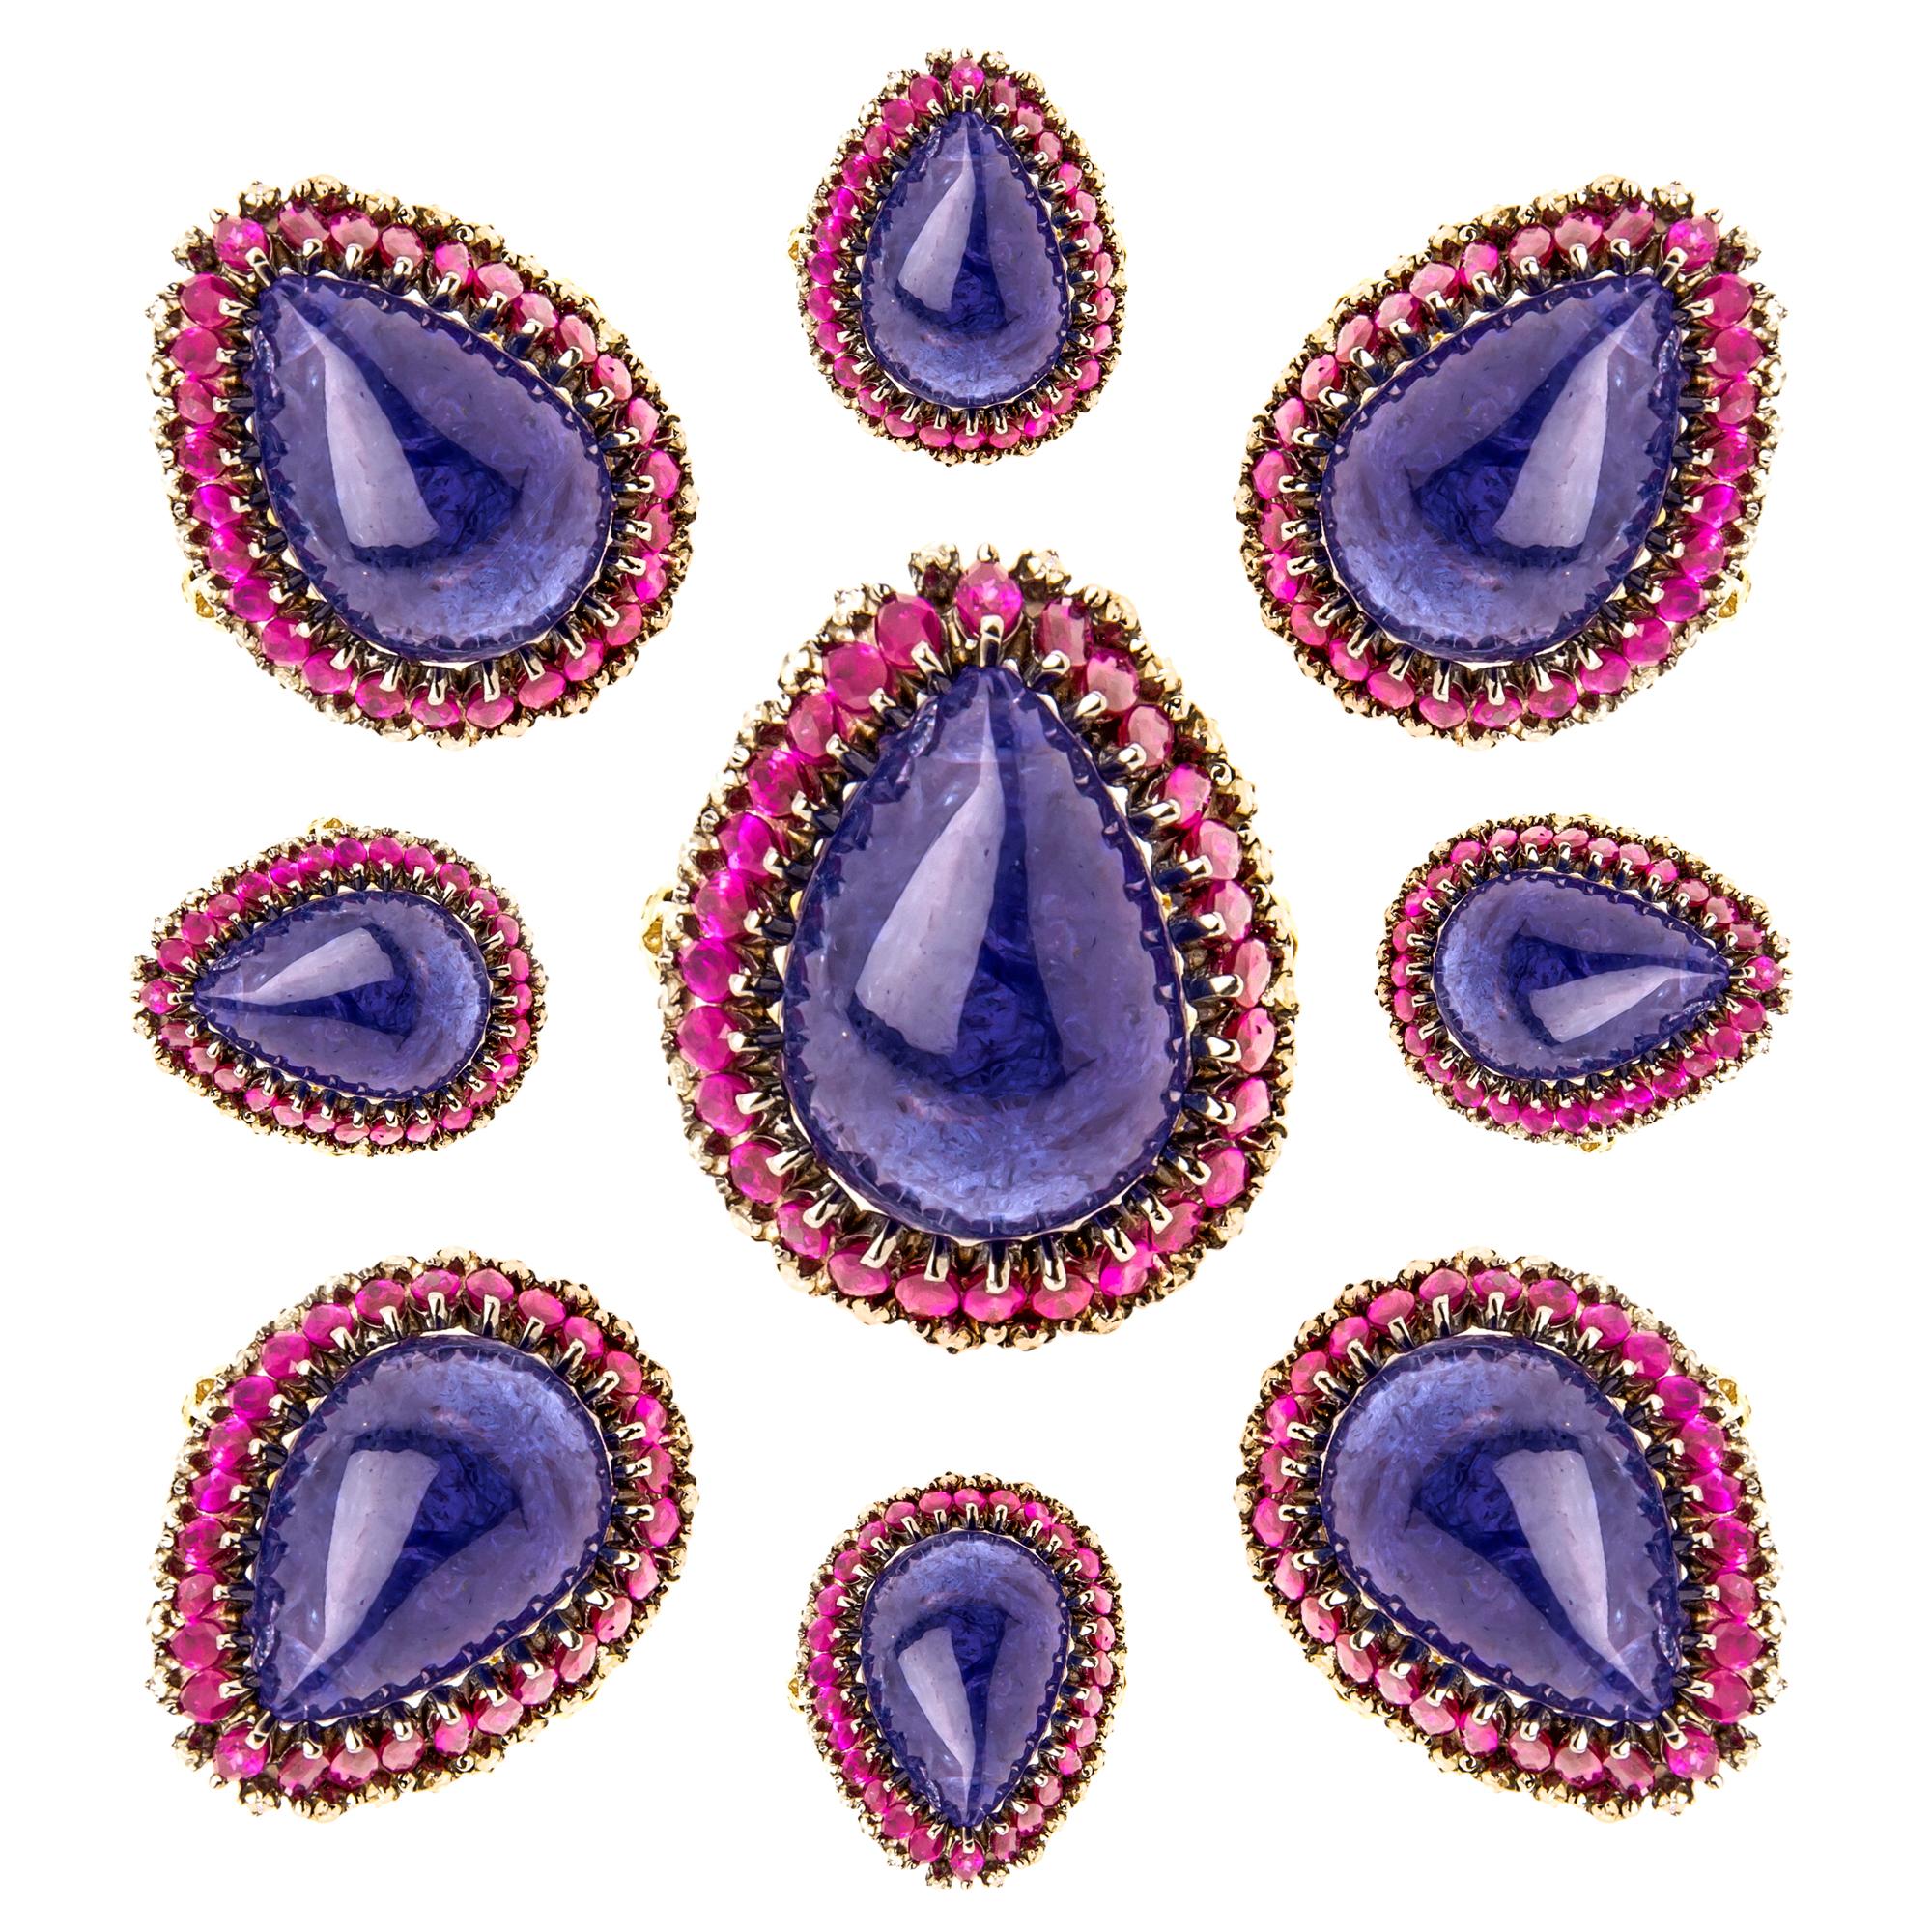 RG1067-Mizana-Jewelry-purplering.jpg